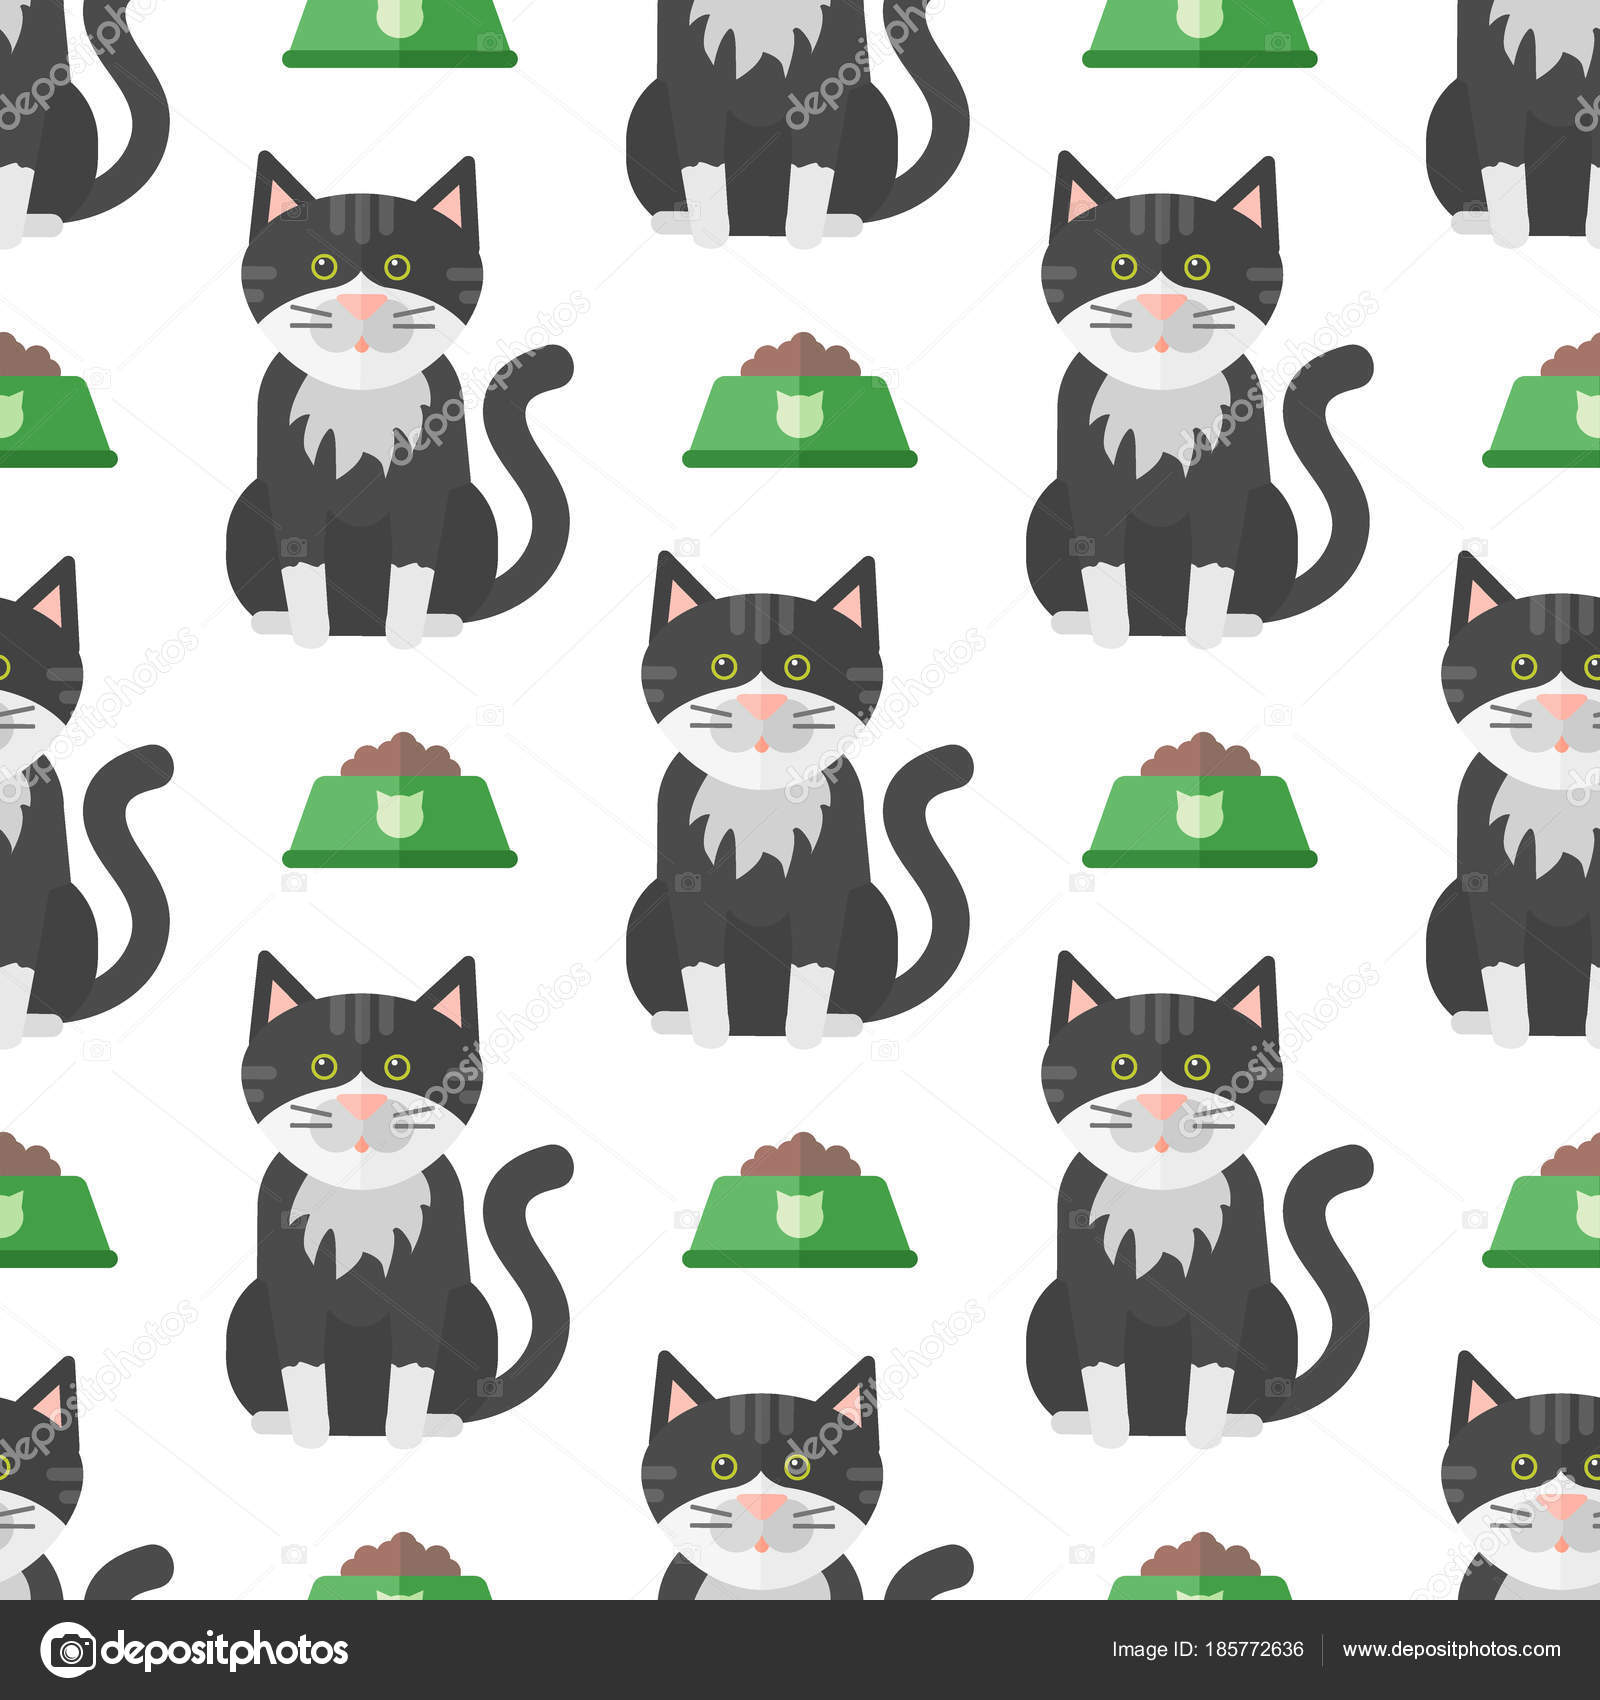 Katzen Köpfe Vektor Illustration niedliche Tiere lustige ...